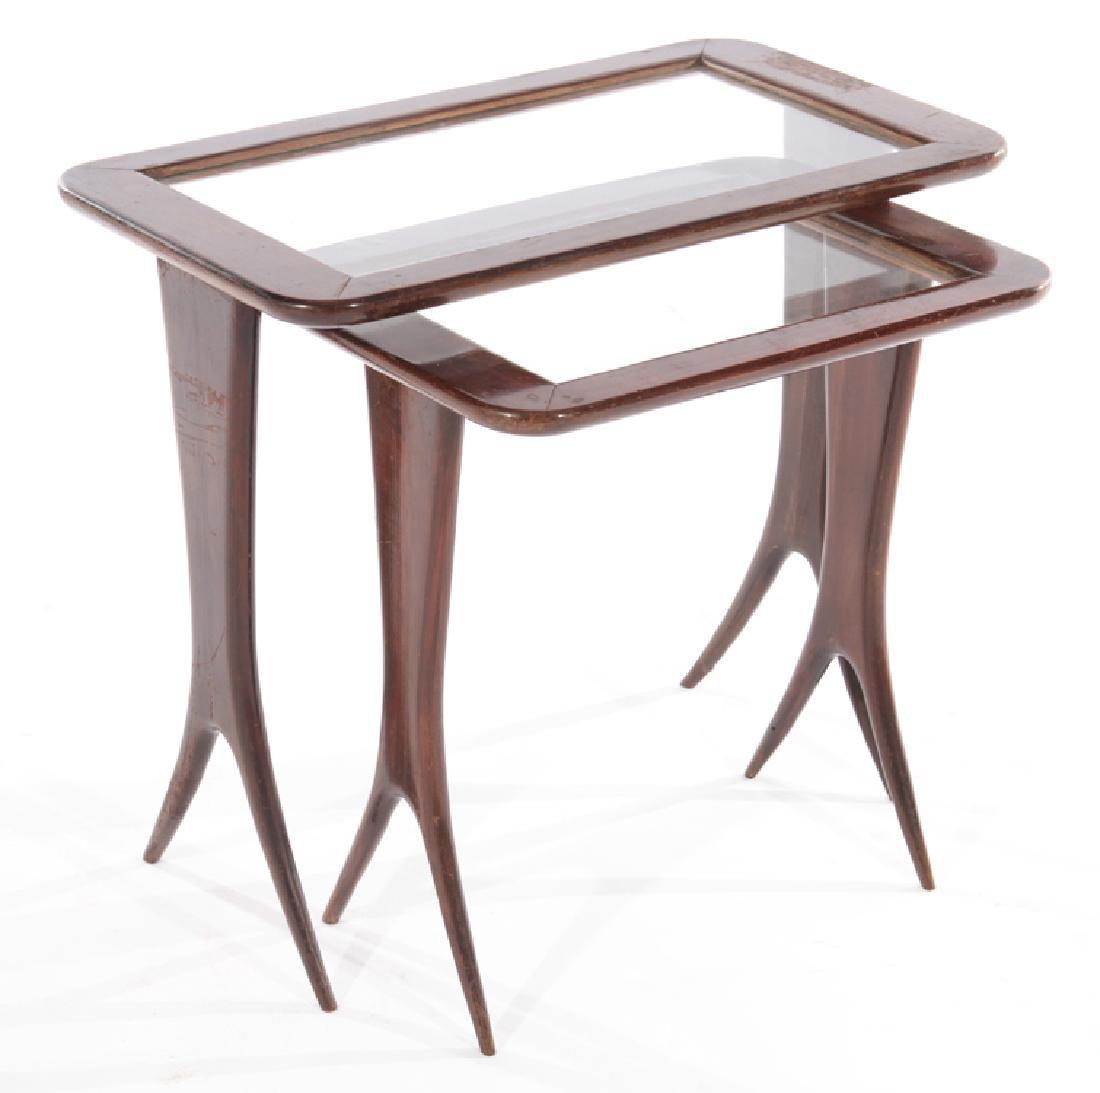 ITALIAN MID CENTURY MODERN NESTING TABLES 1960